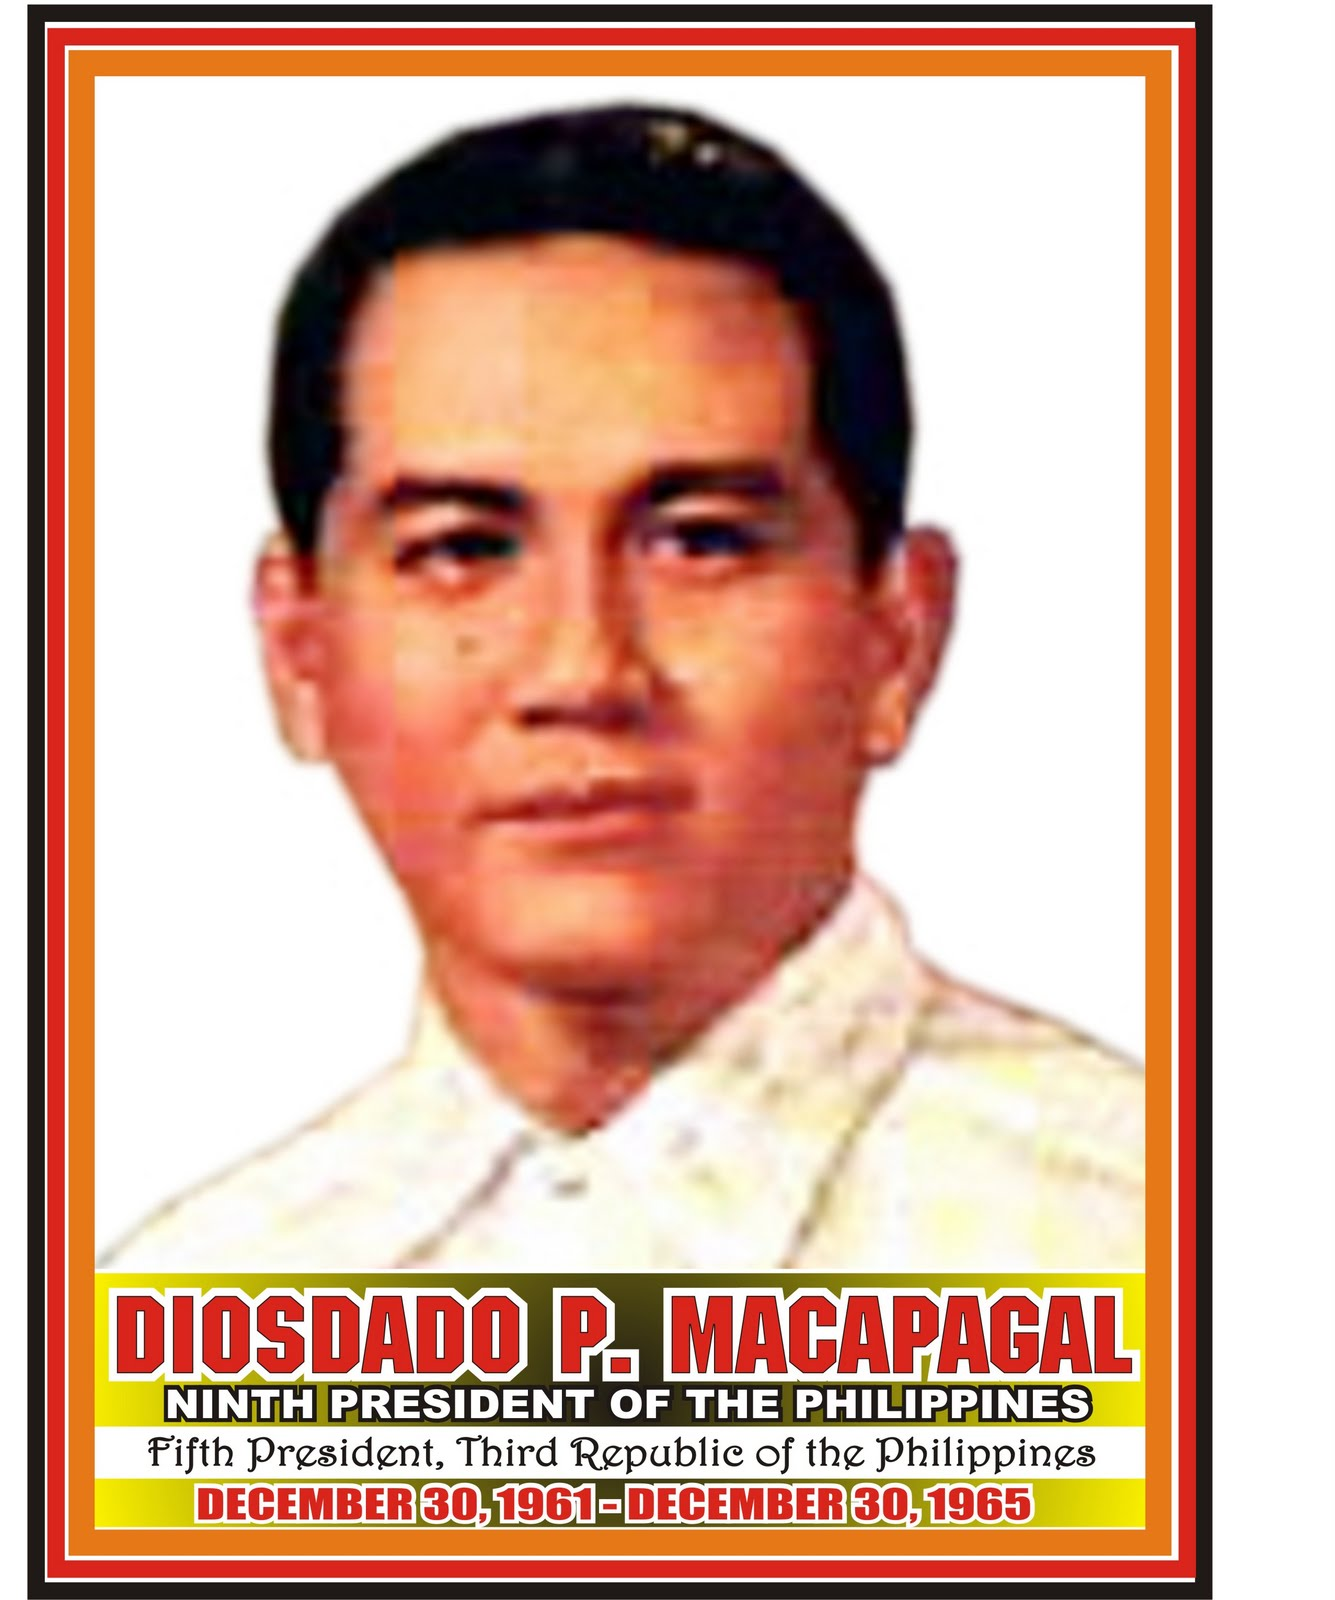 philippine heroes quotes